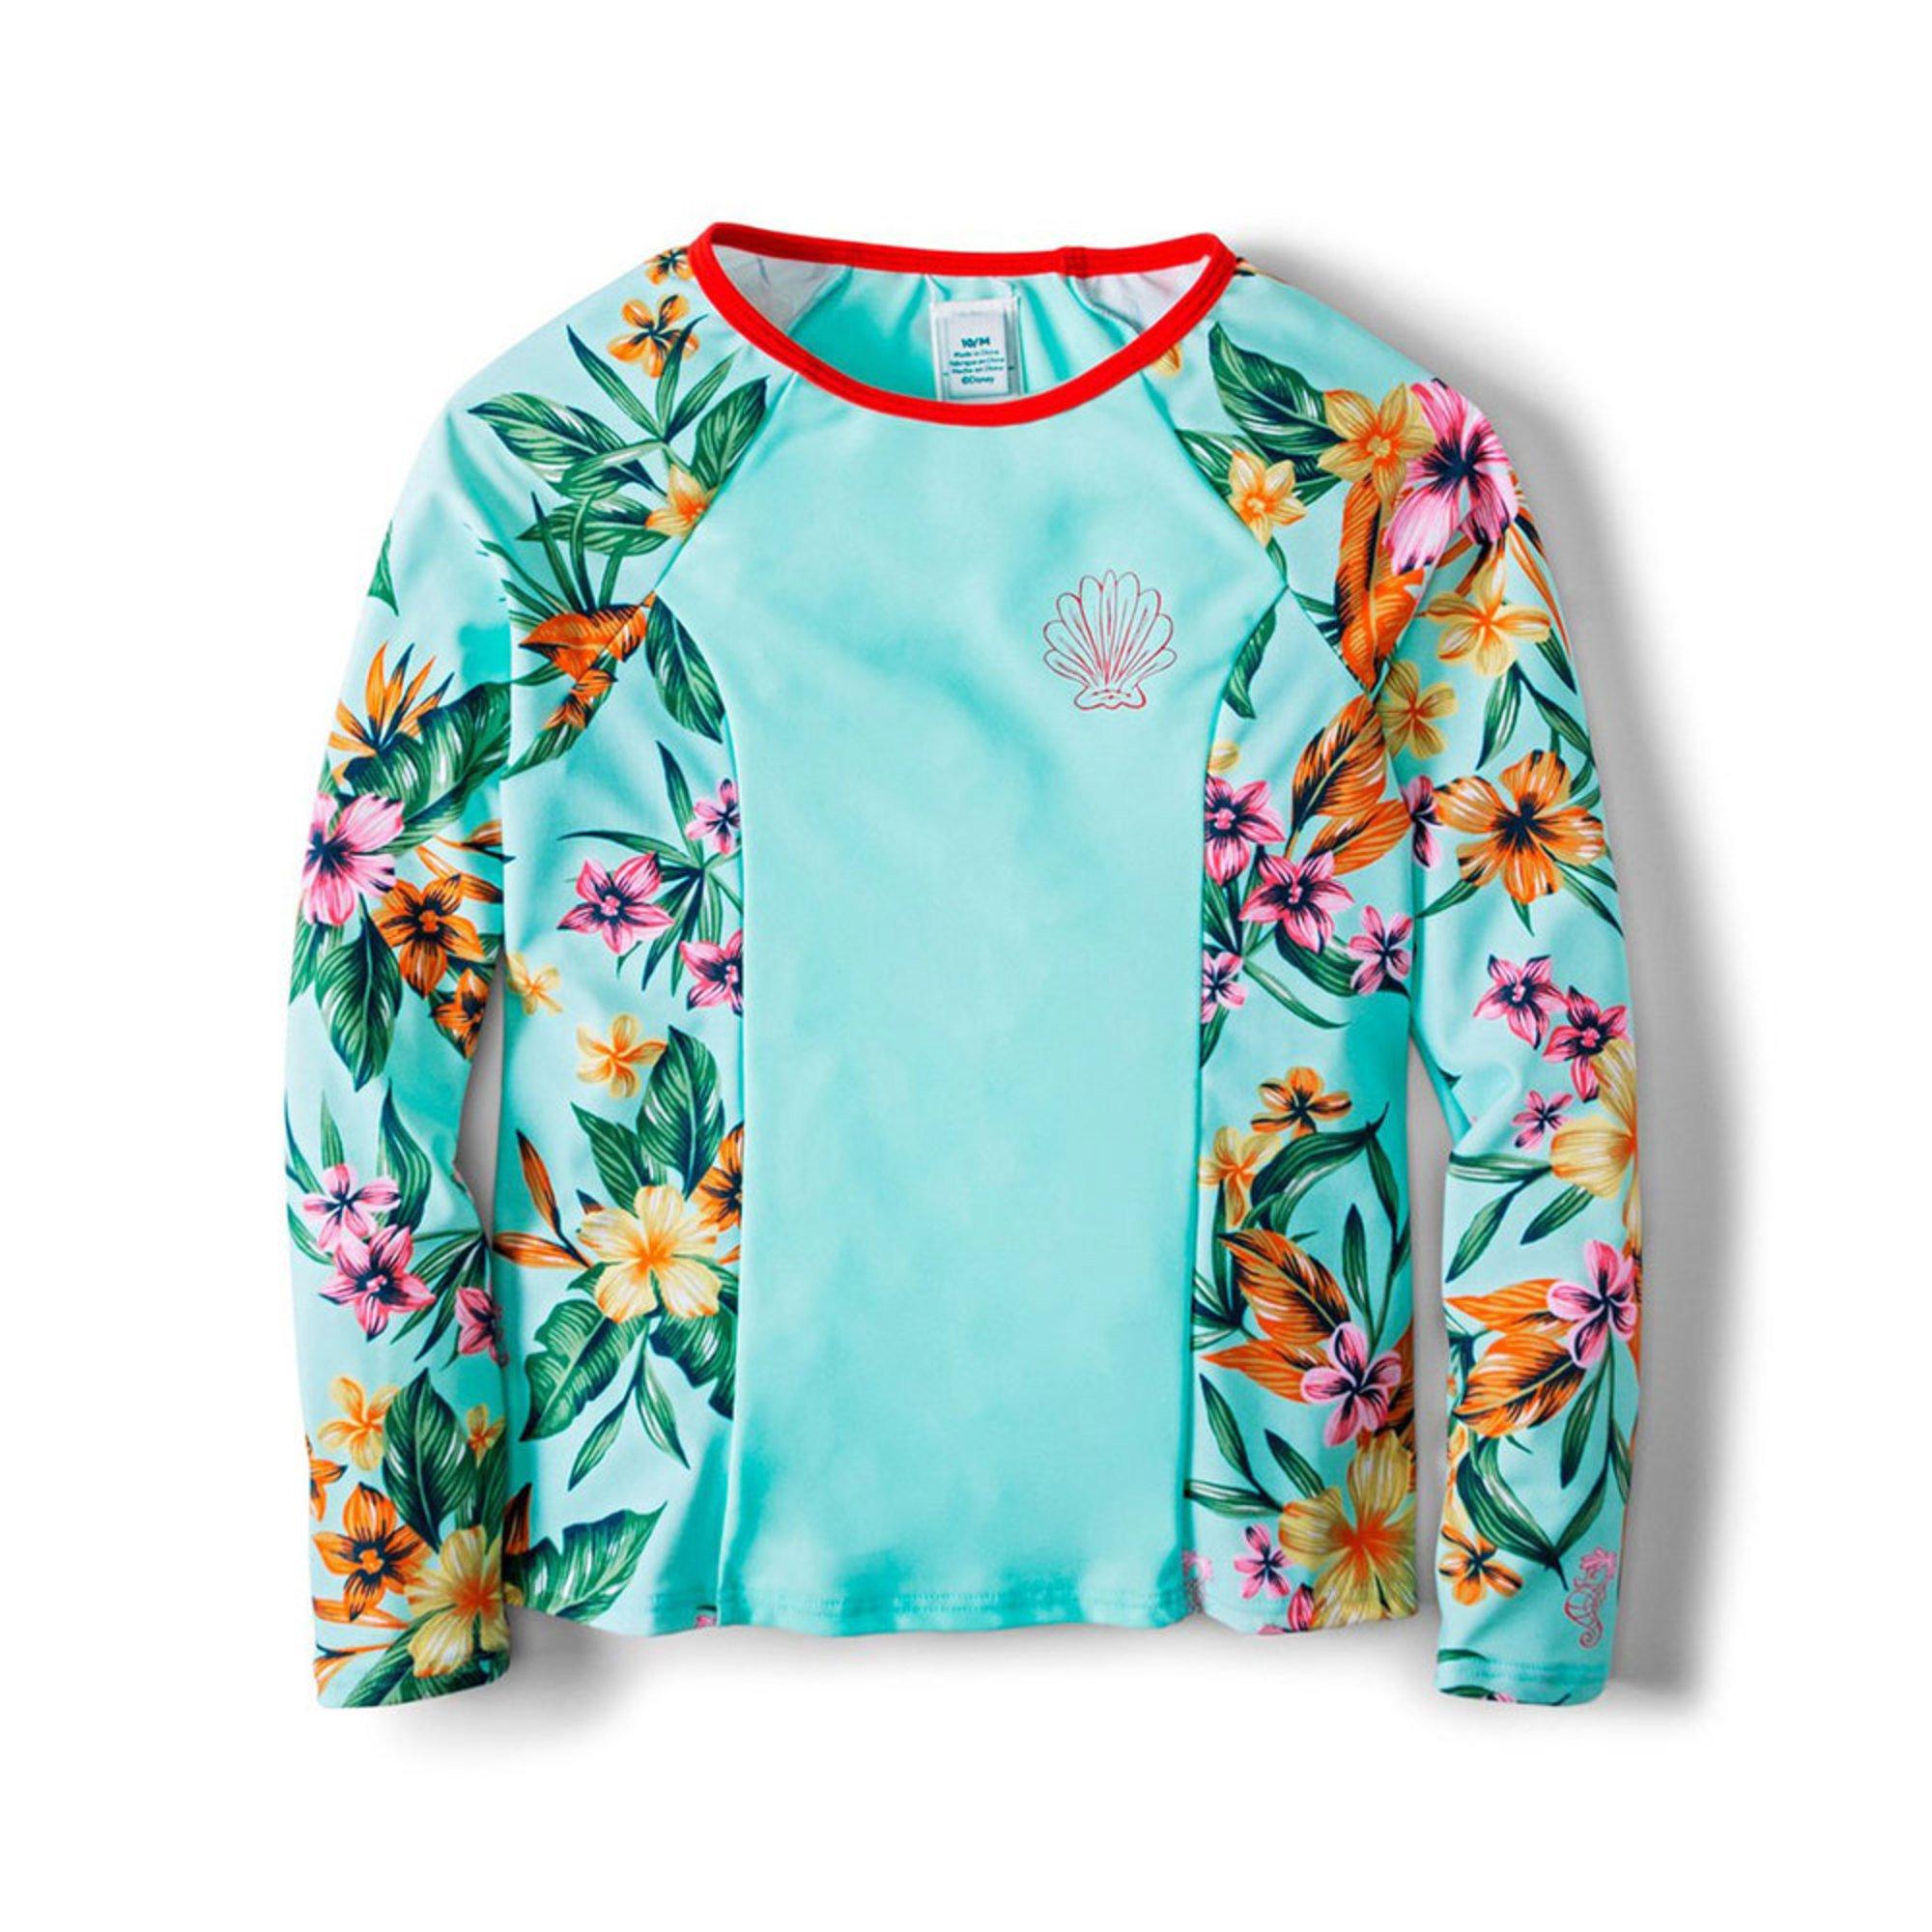 4f93e5ca3f236 Roxy Big Girls' Disney Heritage Floral Long Sleeve Upf 50 Rashguard ...